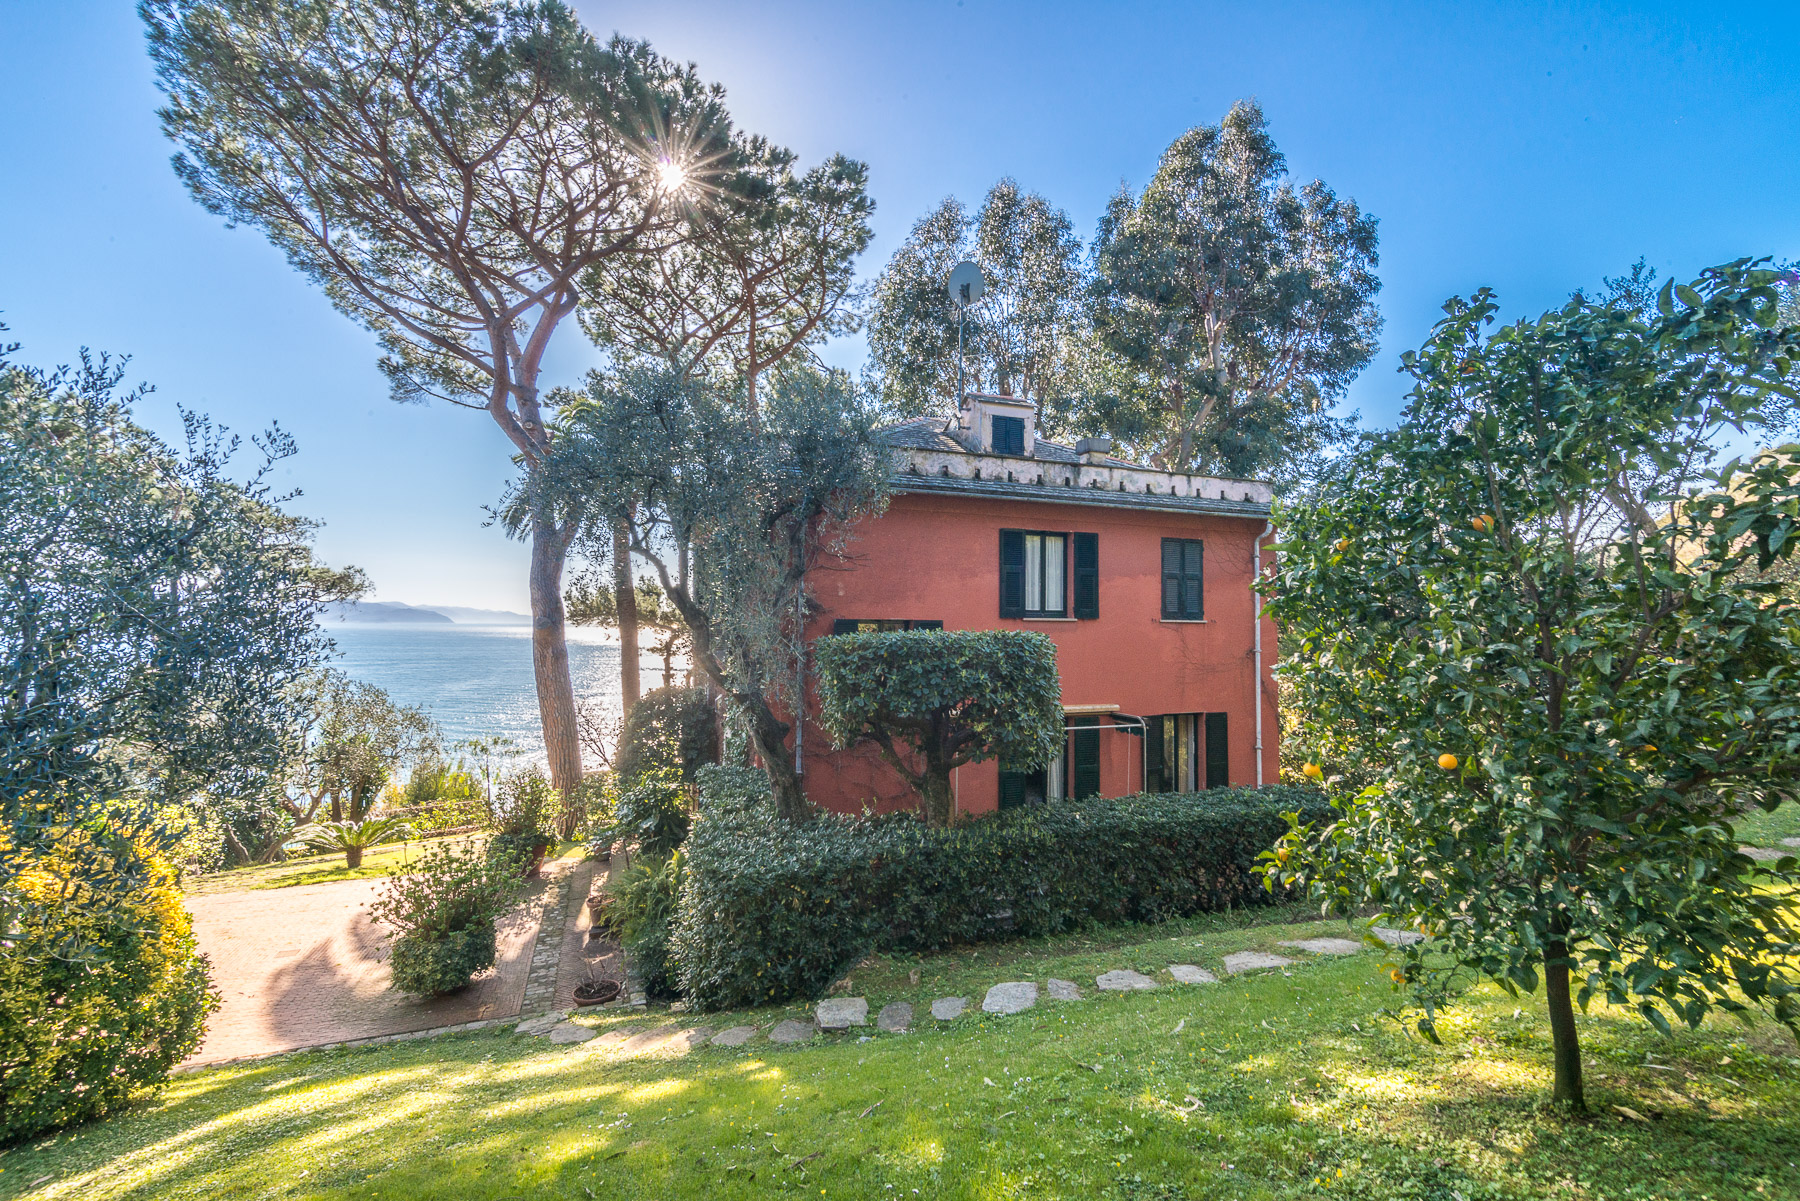 Villa in Vendita a Santa Margherita Ligure: 5 locali, 440 mq - Foto 5